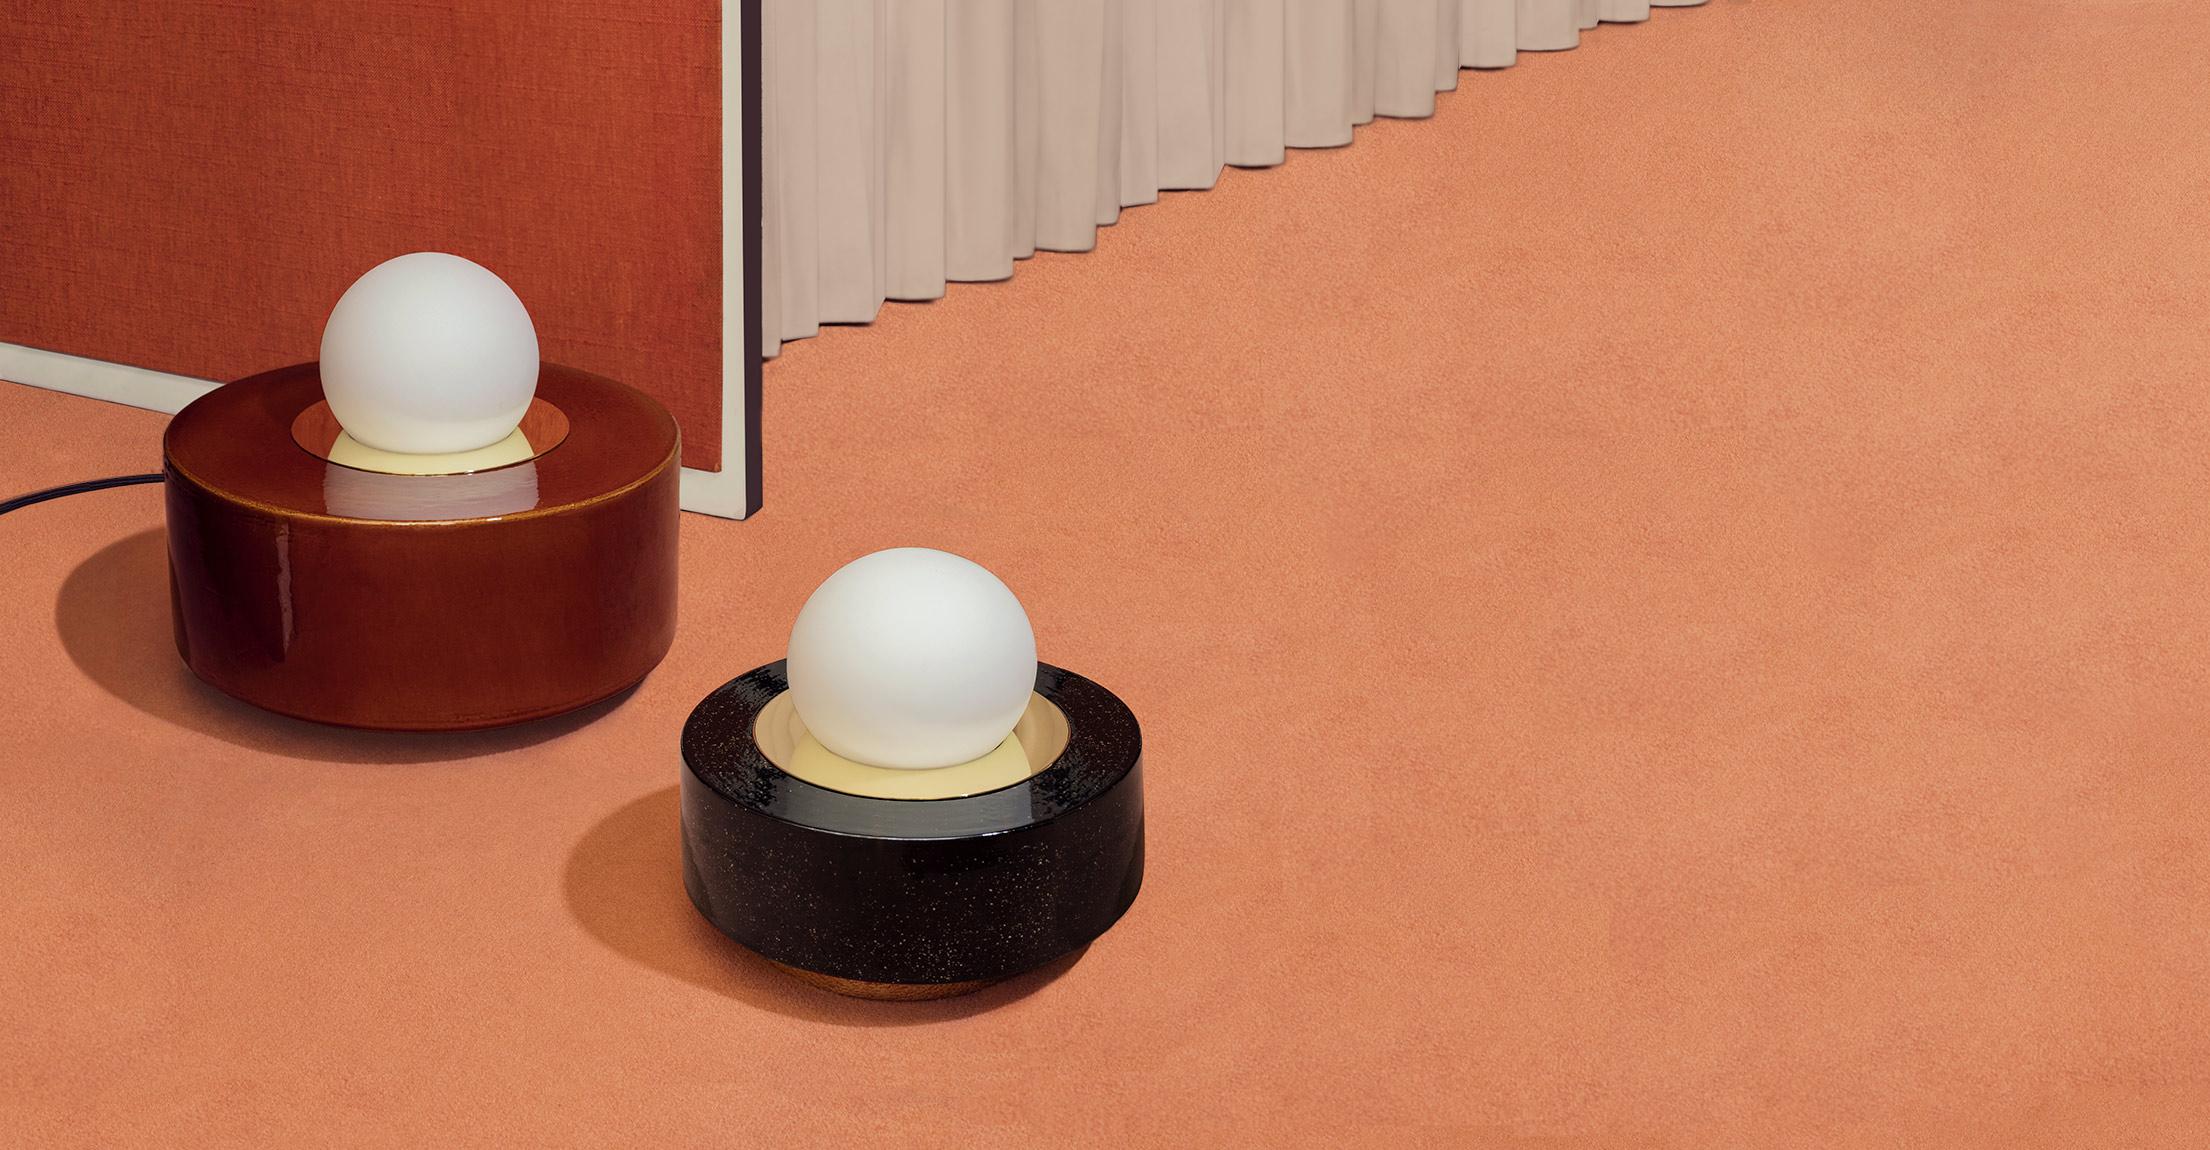 haos-lampe-ceramique-laiton-bandeau6